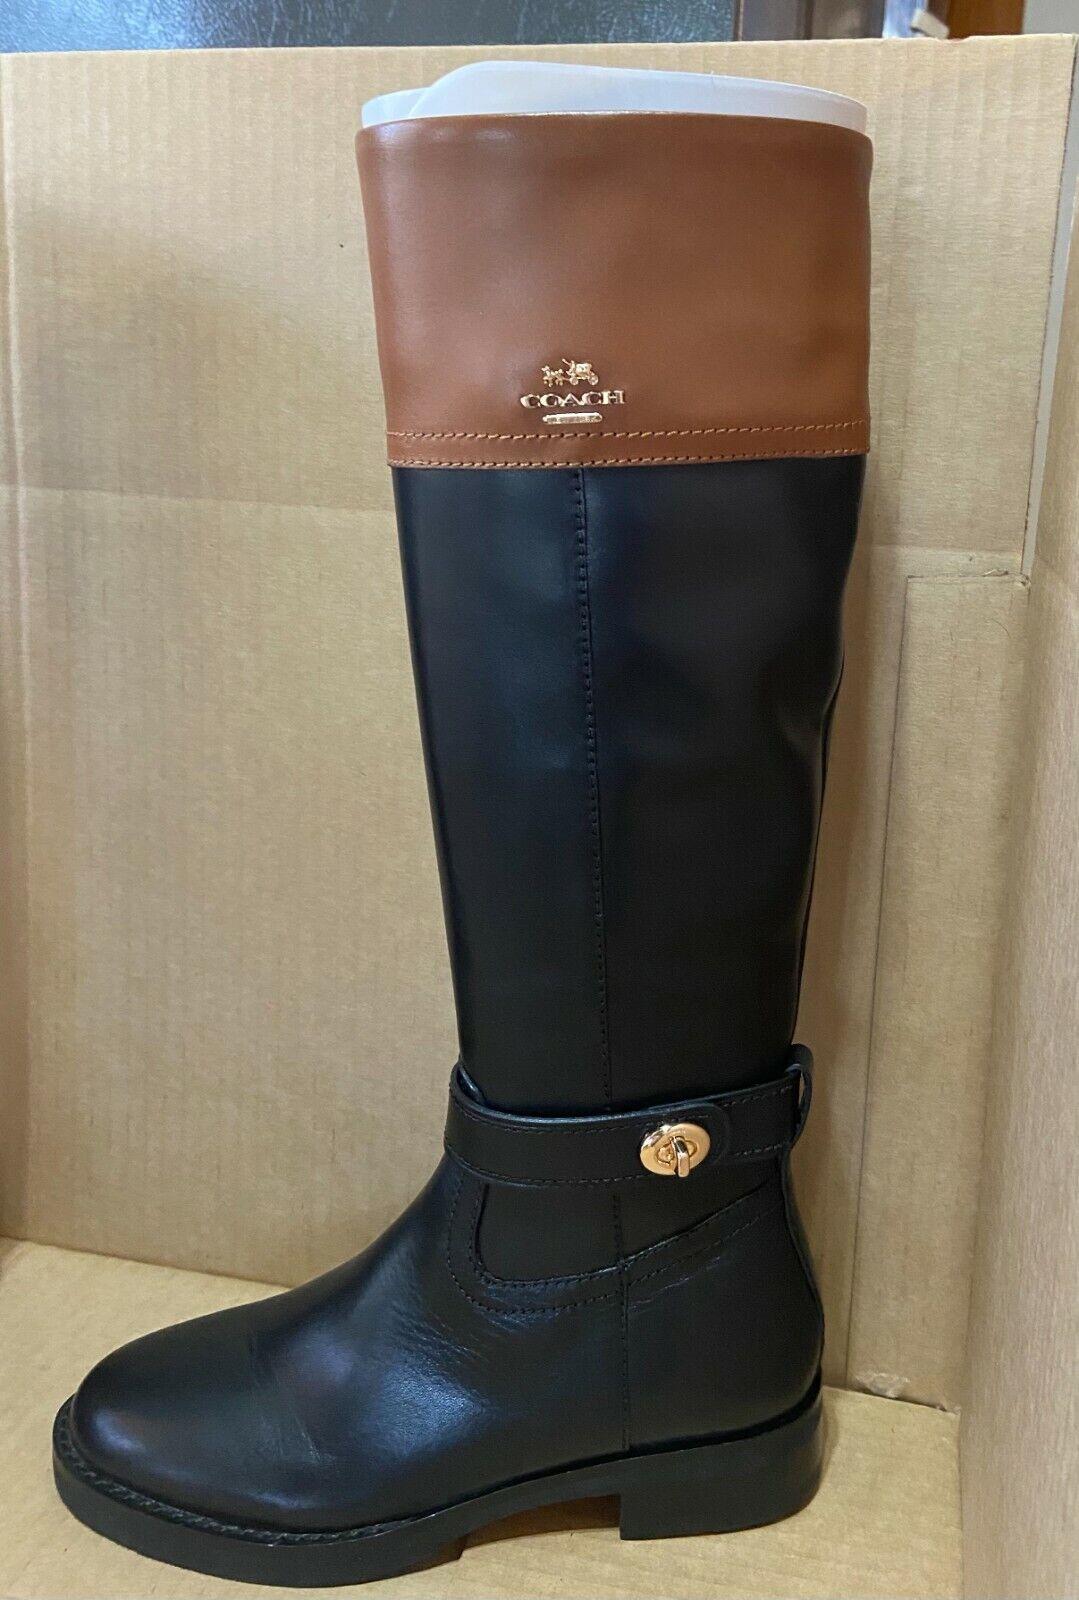 Coach Knee High Boot EVA Skinny Calf Q7660 Size 6 Black/Saddle with box NWB